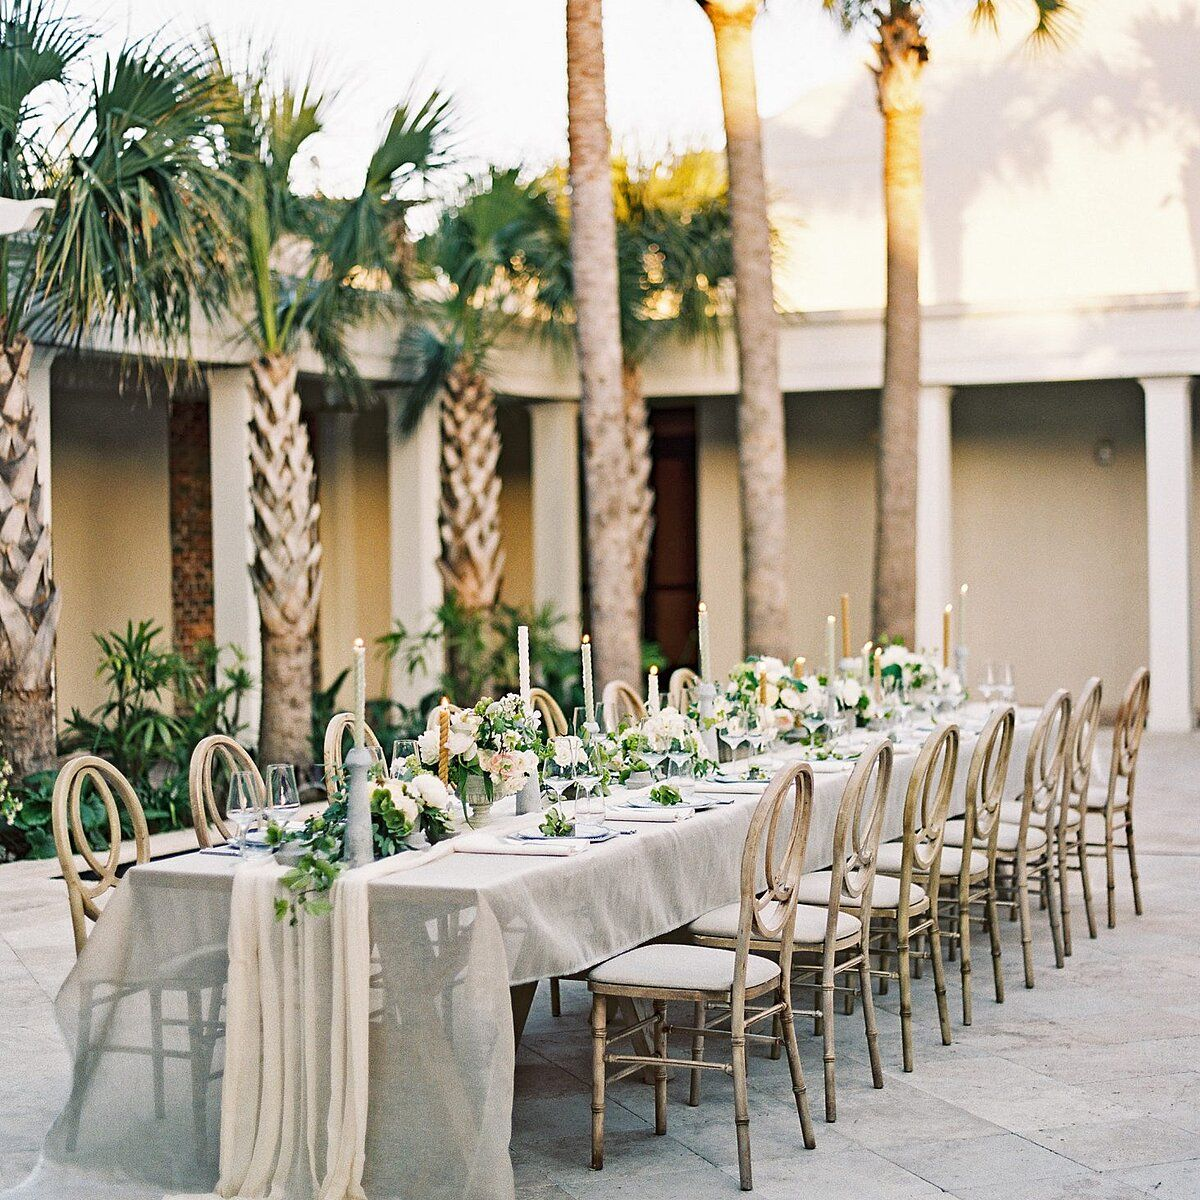 Weddings At Swan Club In Roslyn Ny Wedding Spot Wedding Venue Prices Wedding Venues Long Island Wedding Venues